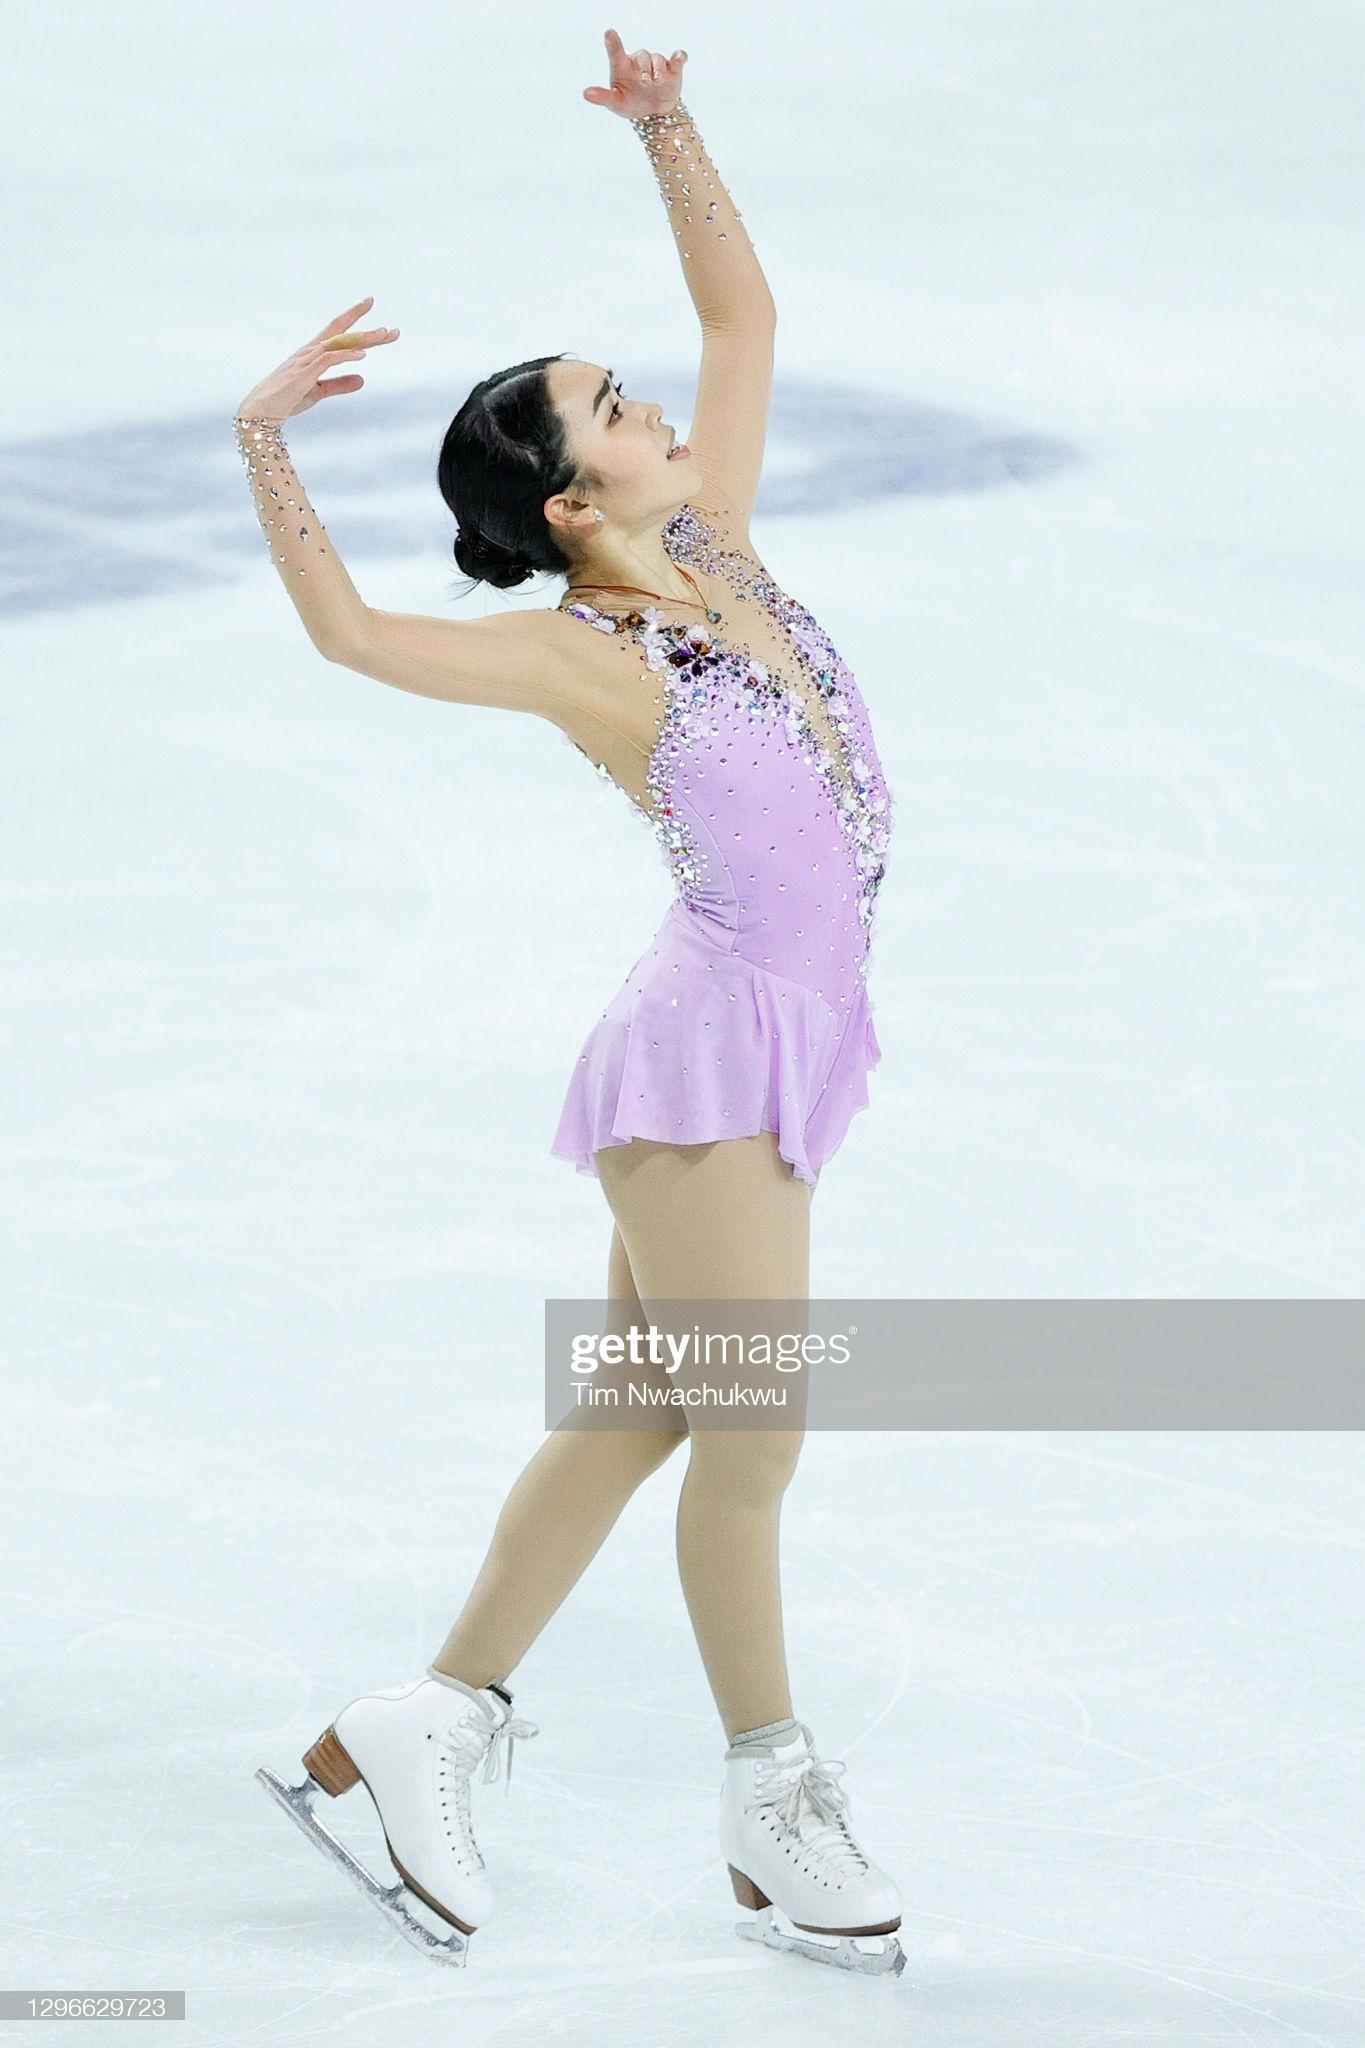 https://i.ibb.co/3fBpQYJ/LAS-VEGAS-NEVADA-JANUARY-15-Karen-Chen-competes-in-the-ladies-free-skate-during-the-U-S-Figure-Skati.jpg